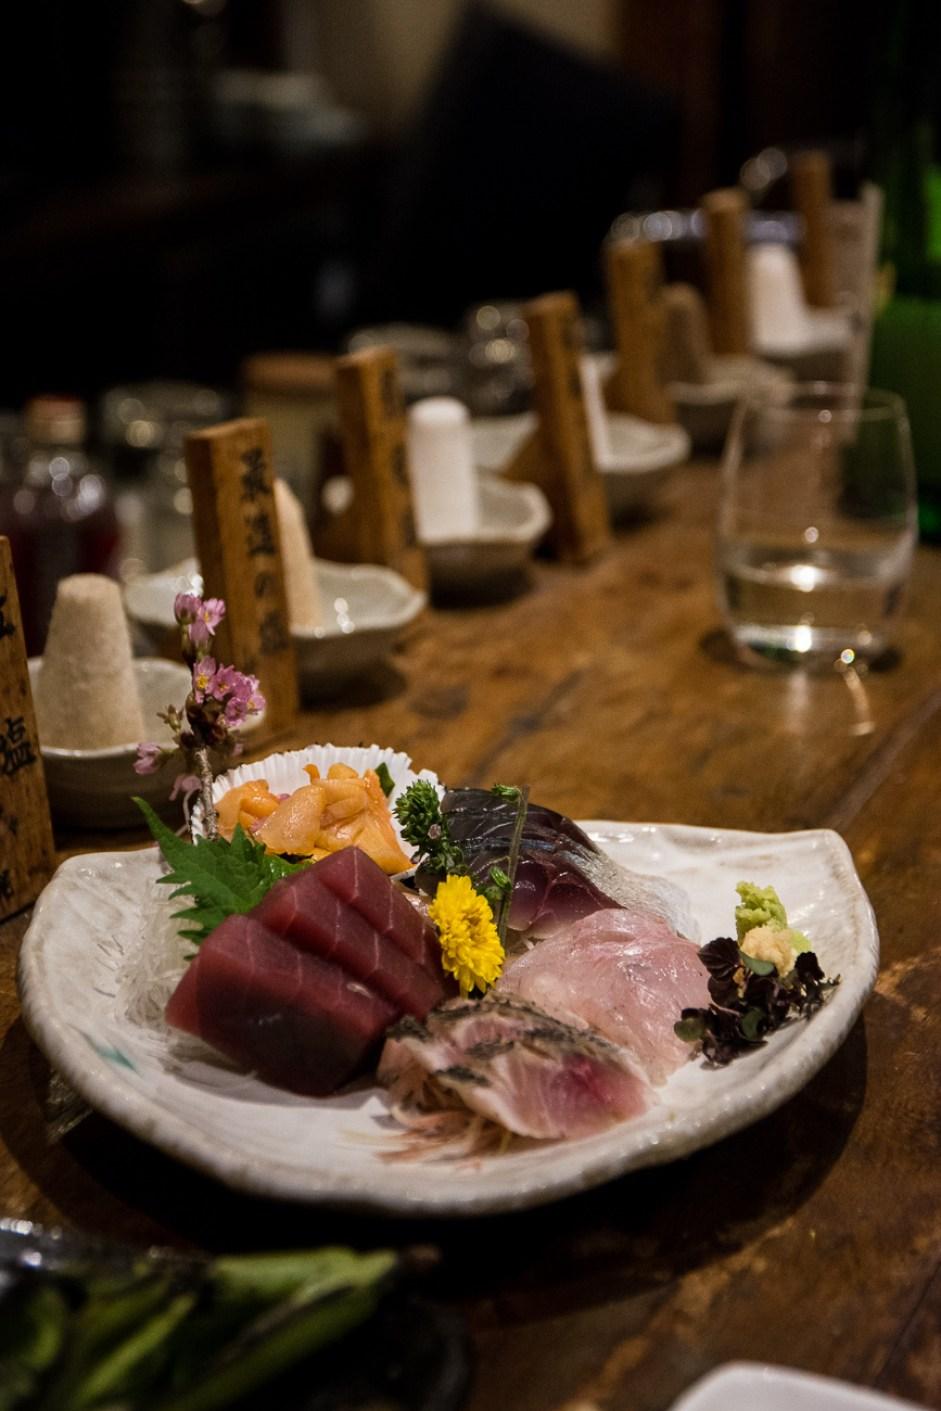 le plat de sashimi servi dans l'izakaya Galali à Tokyo